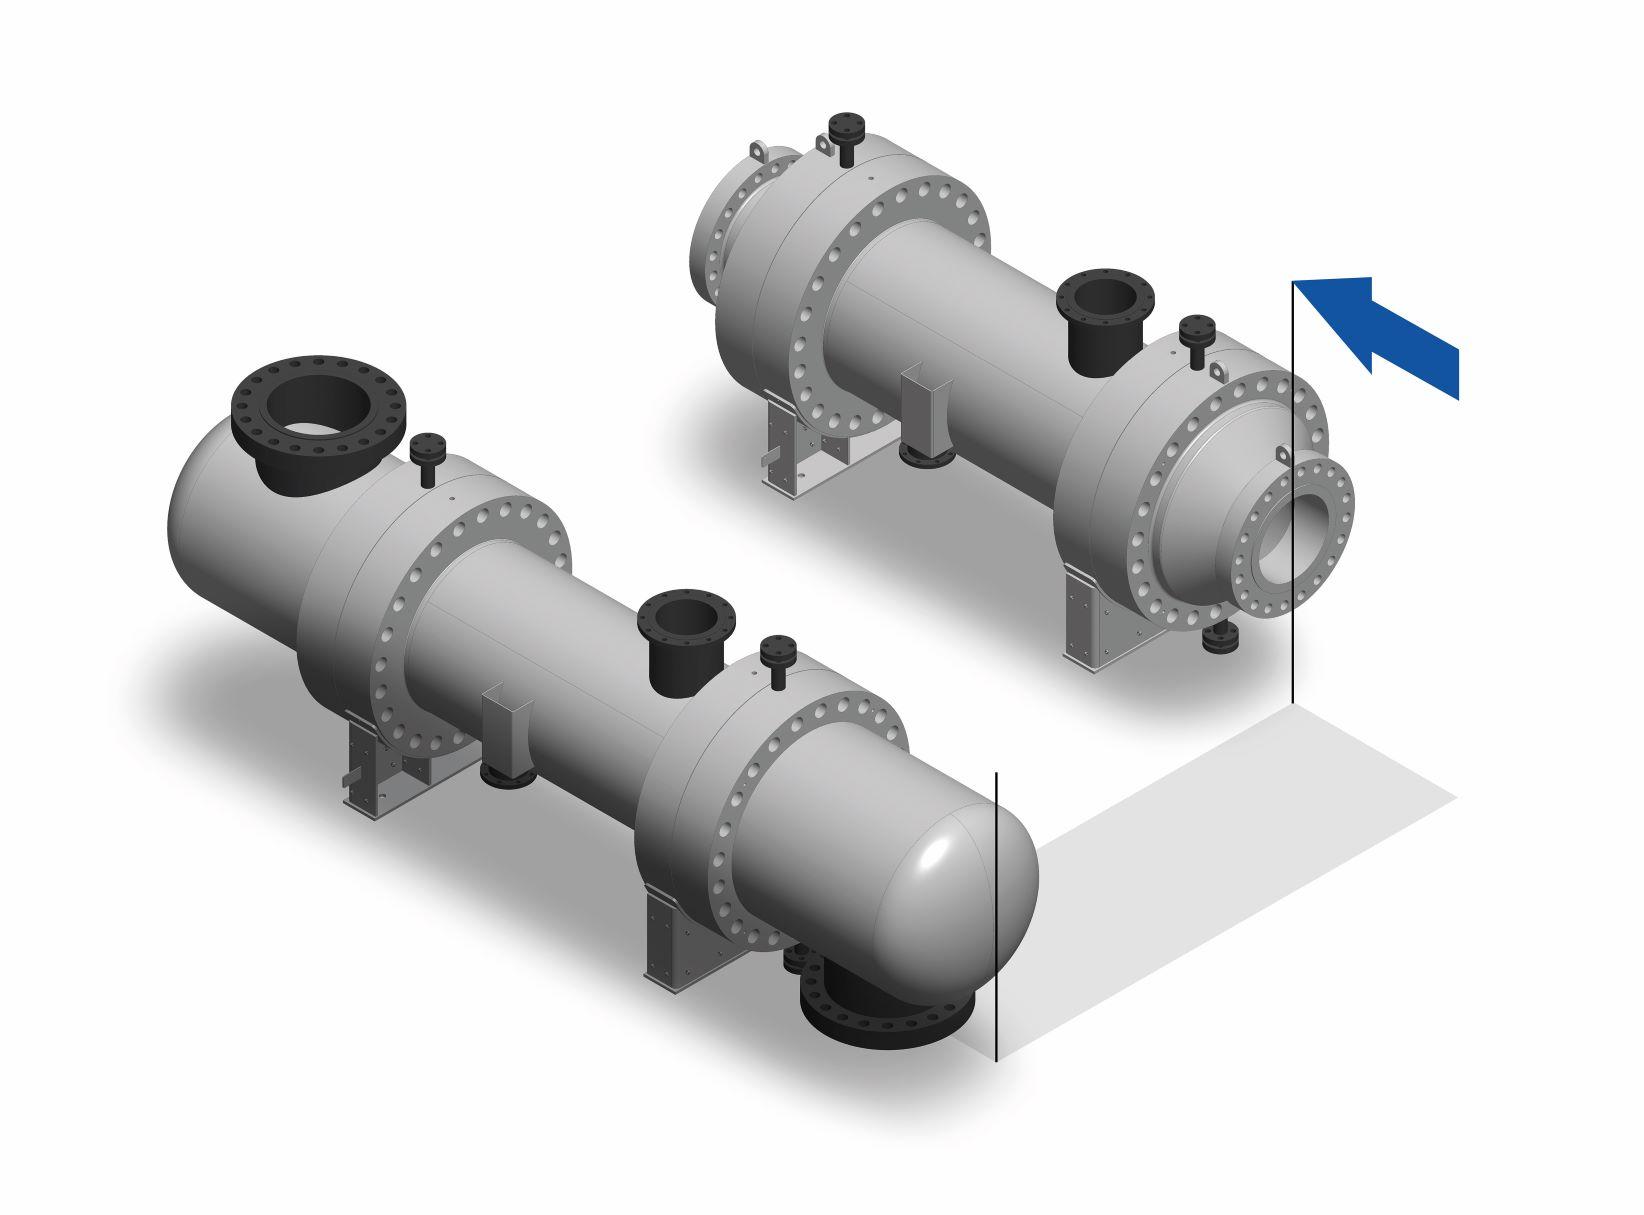 2.03 - design optimization shell & tube heat exchangers foto 02 klein formaat